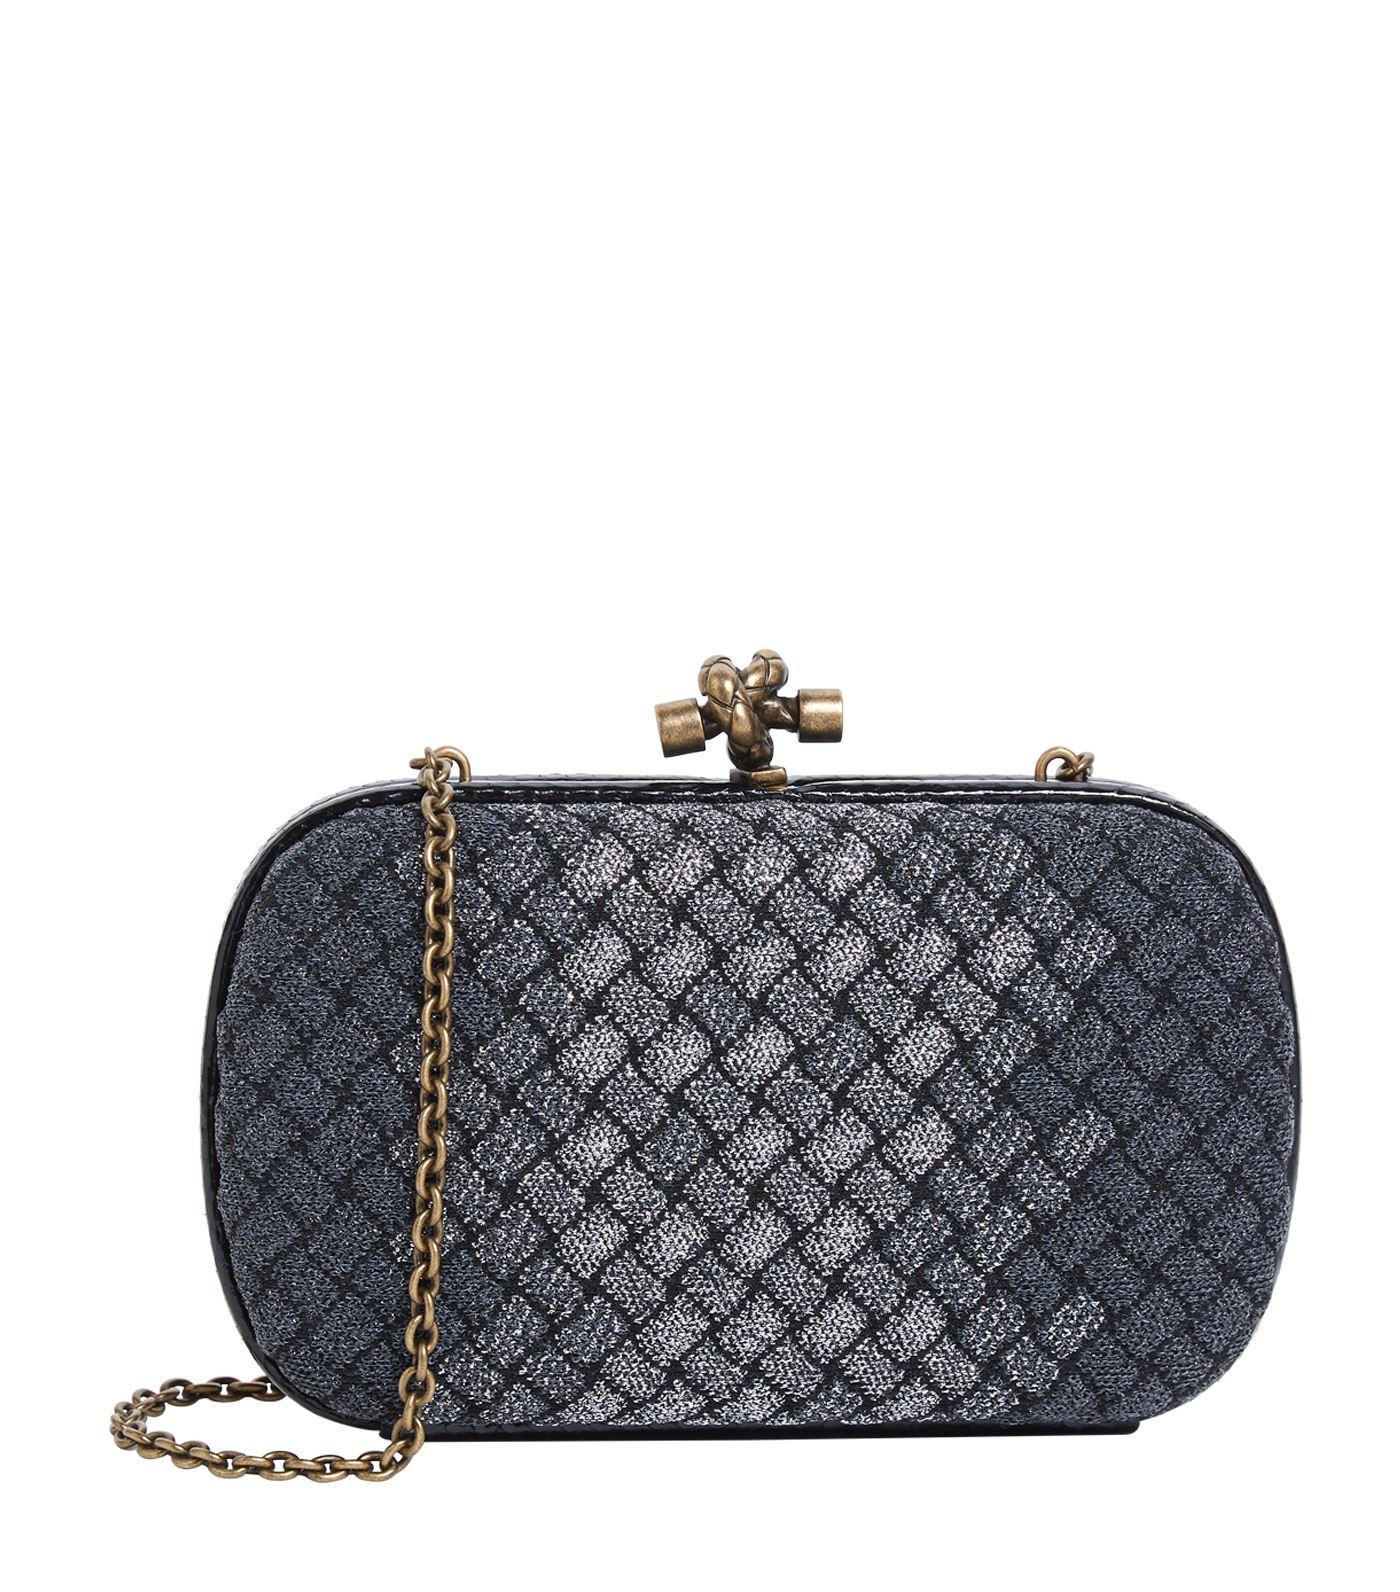 Lyst - Bottega Veneta Knot Clutch Bag in Black - Save 19% f0cabbdfd2ea4